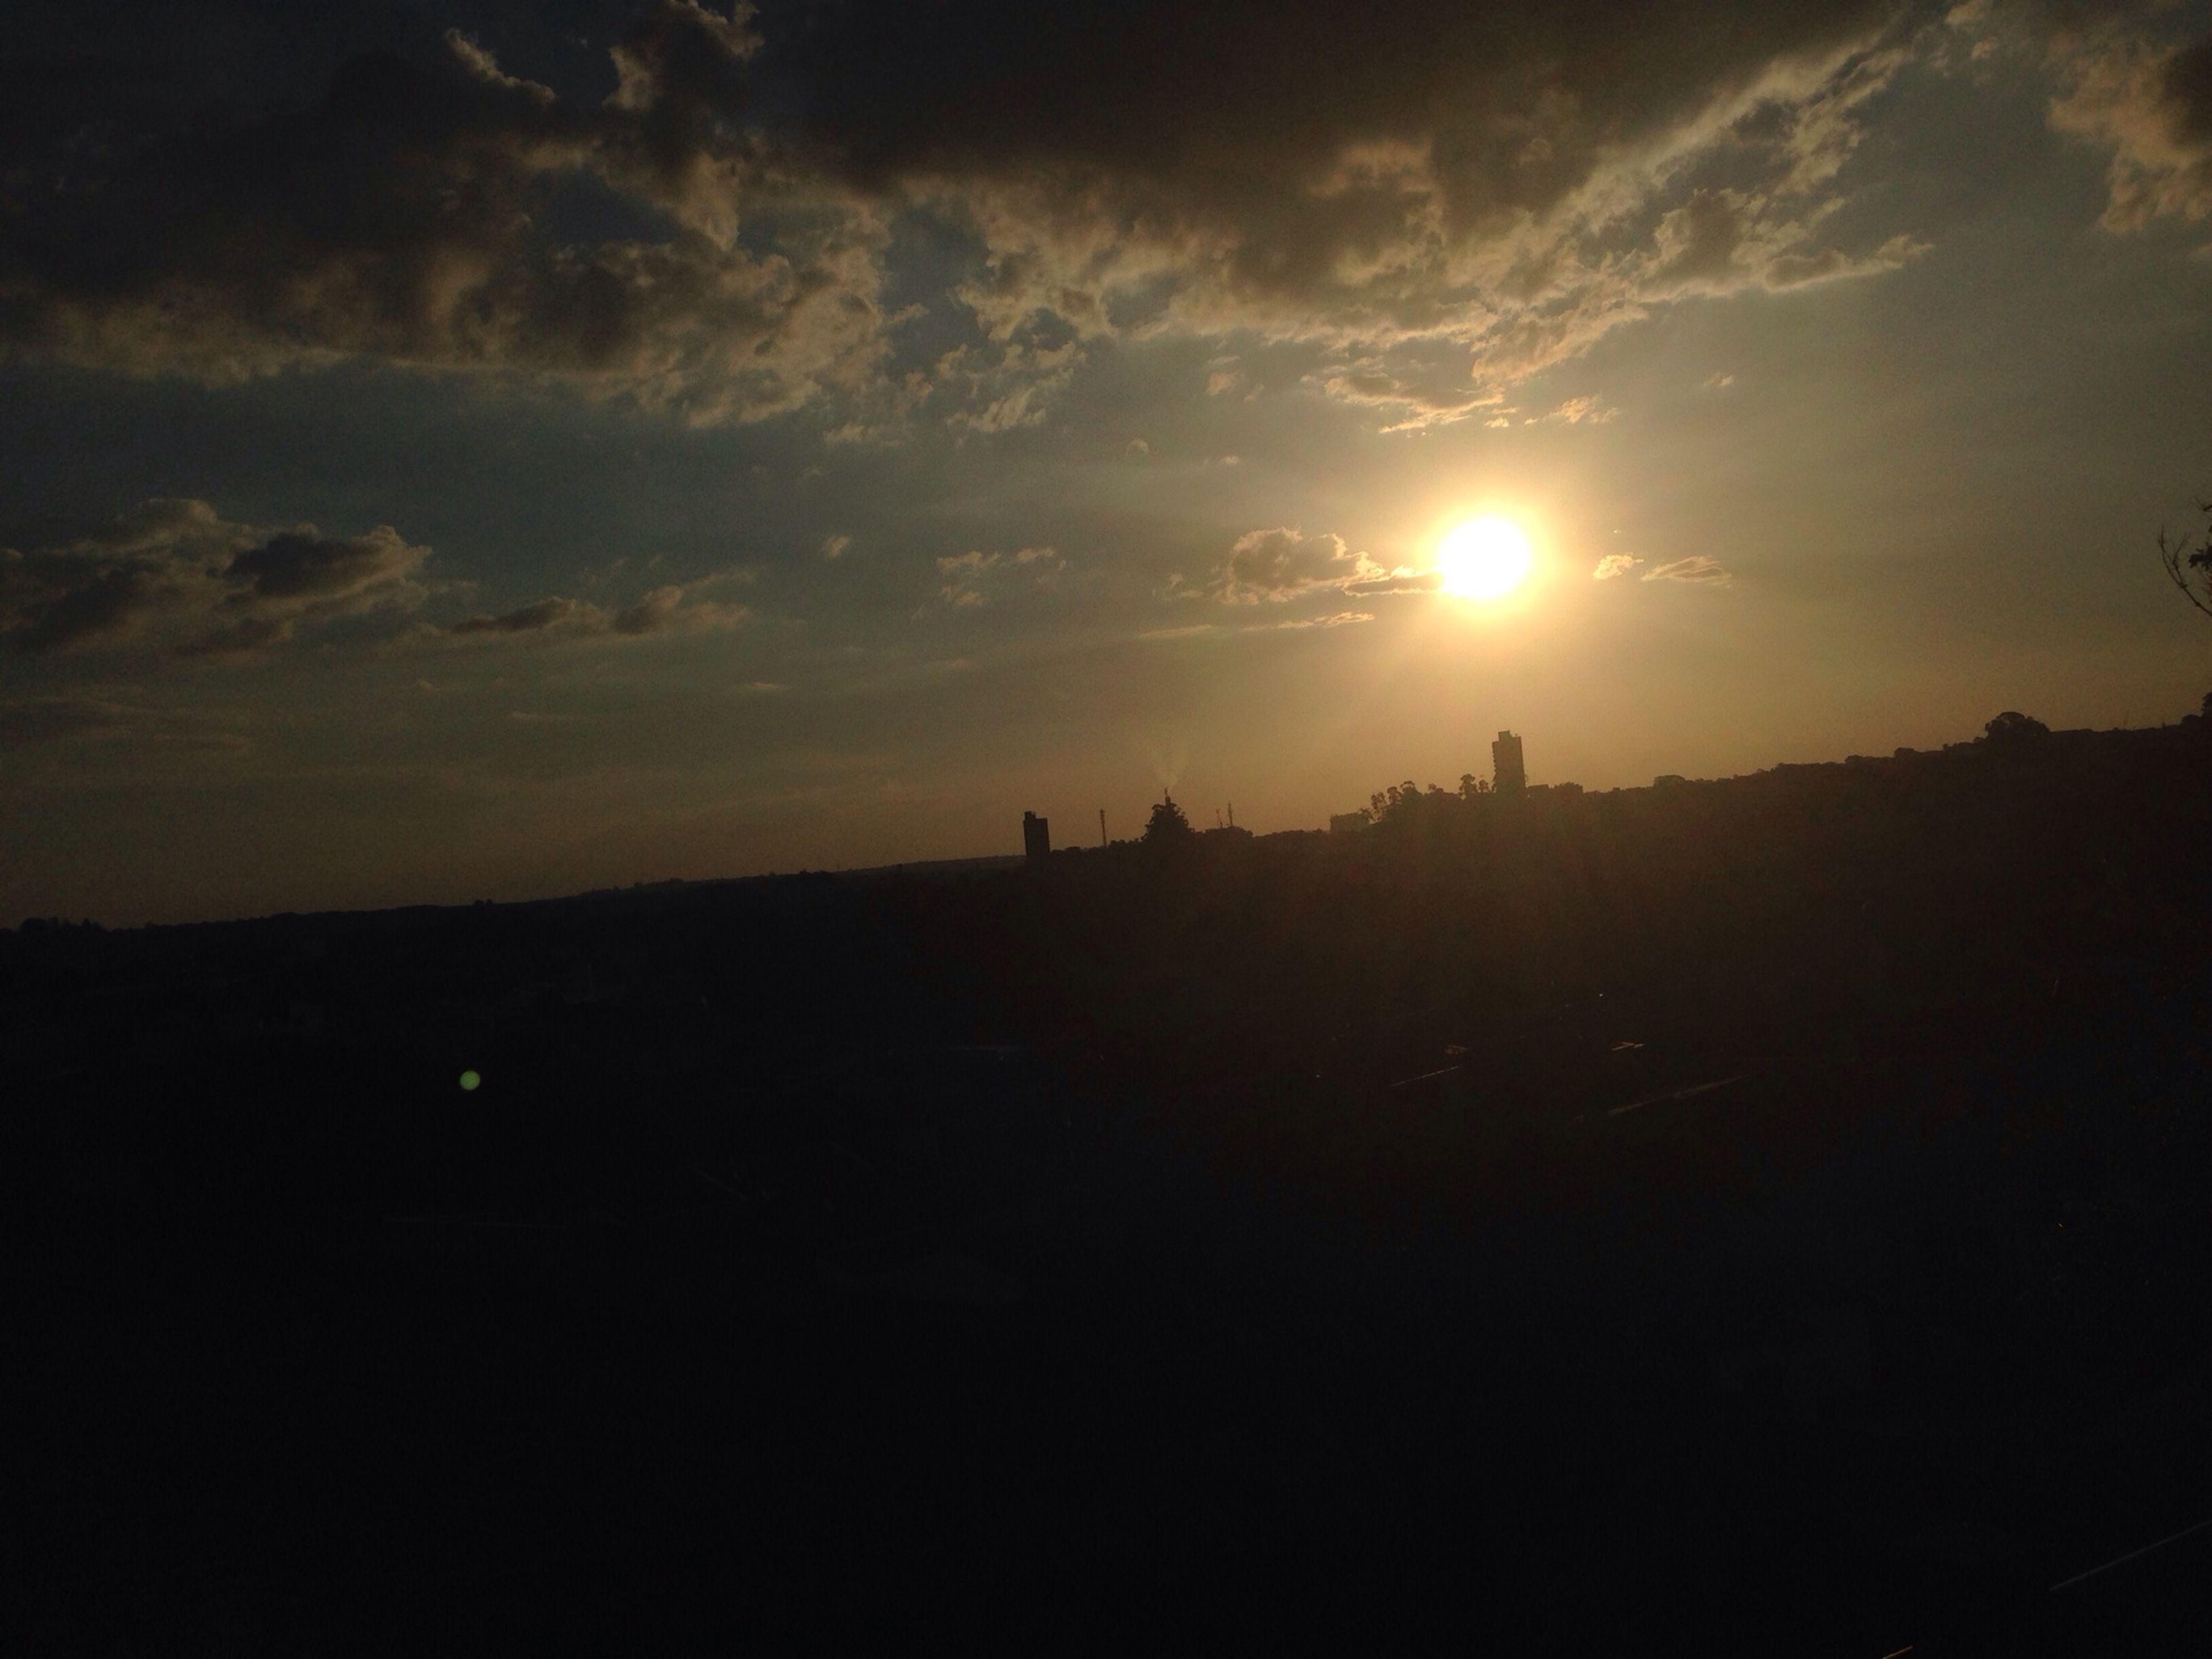 silhouette, sunset, sky, landscape, tranquil scene, scenics, sun, tranquility, beauty in nature, cloud - sky, nature, sunlight, cloud, idyllic, sunbeam, unrecognizable person, outline, outdoors, field